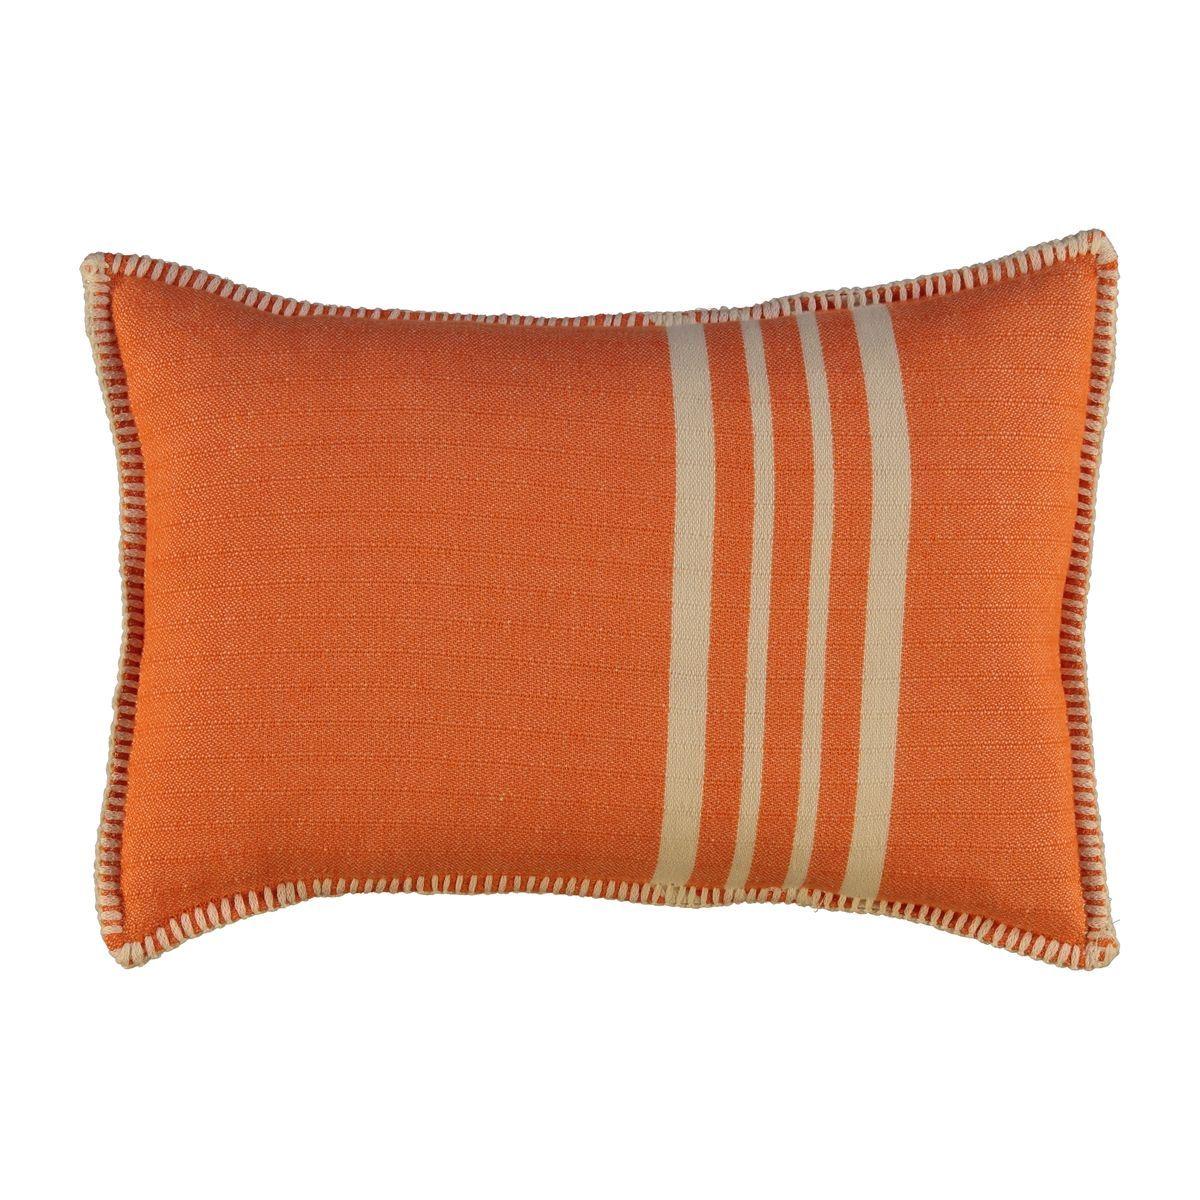 Cushion Cover Sultan - Orange / 30x40